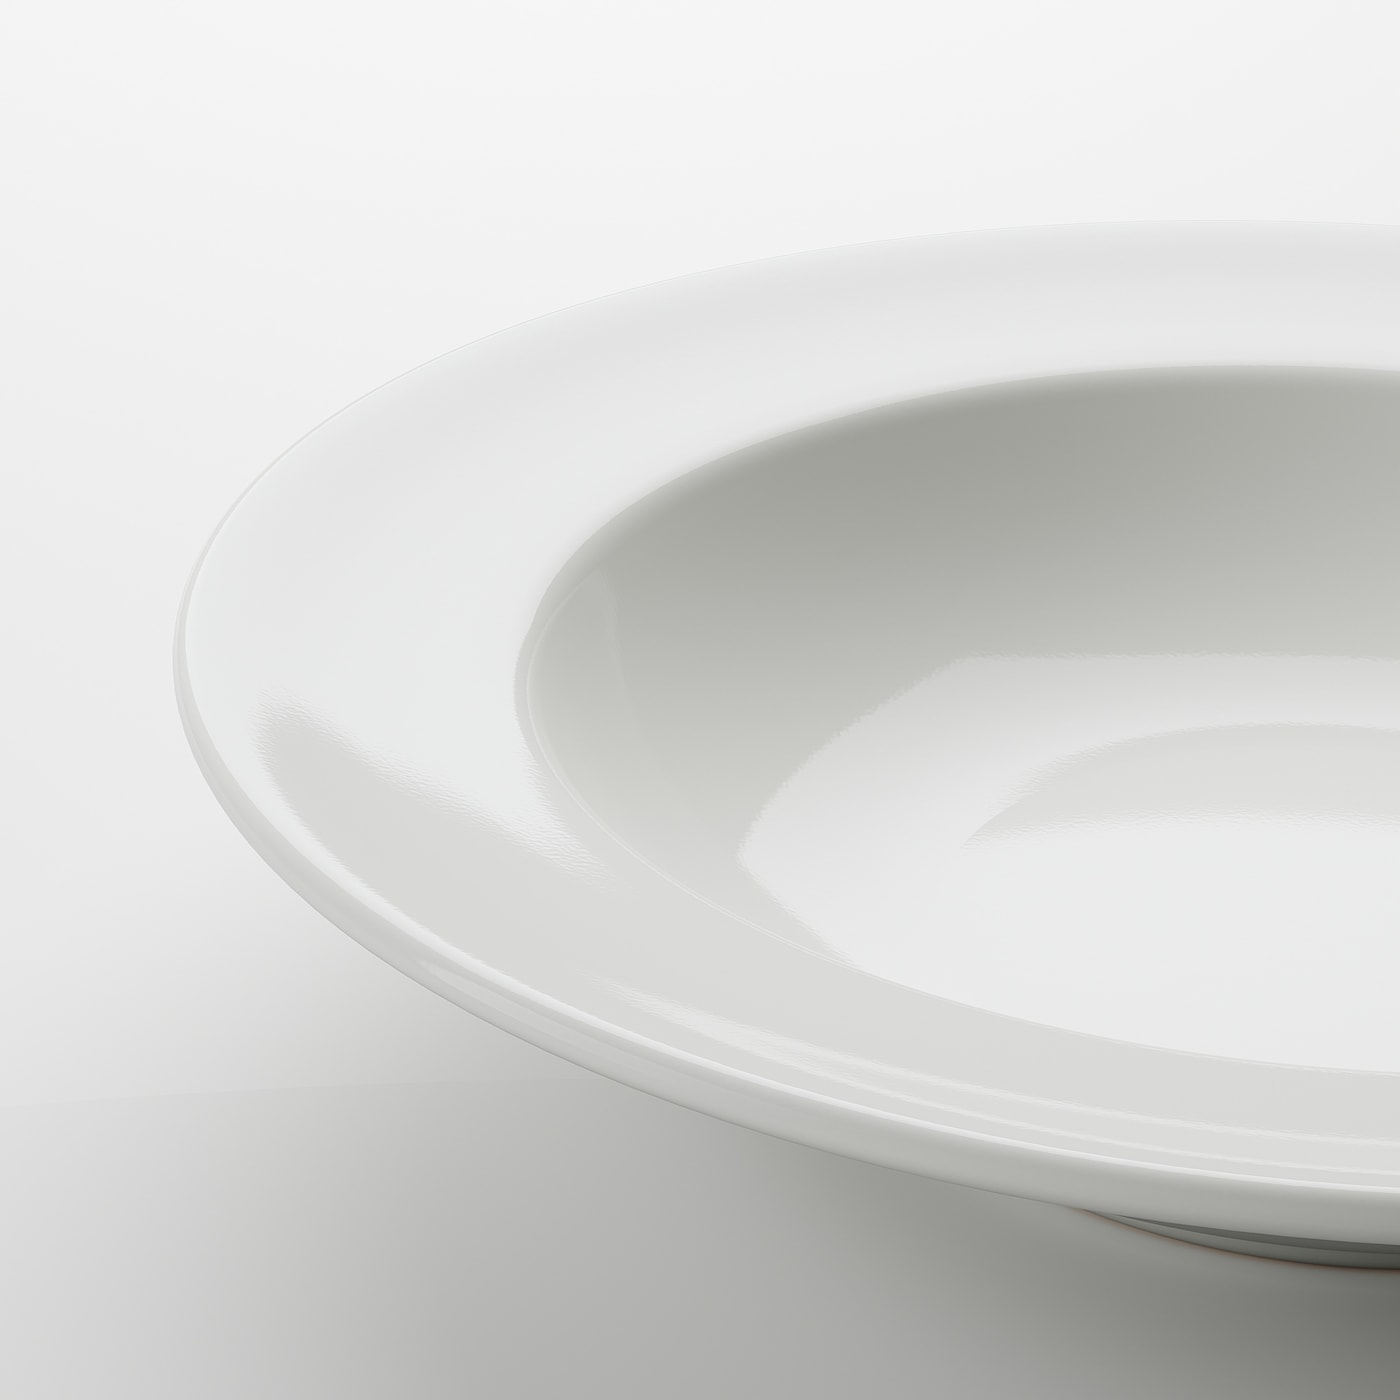 VARDAGEN Diep bord, ecru, 23 cm